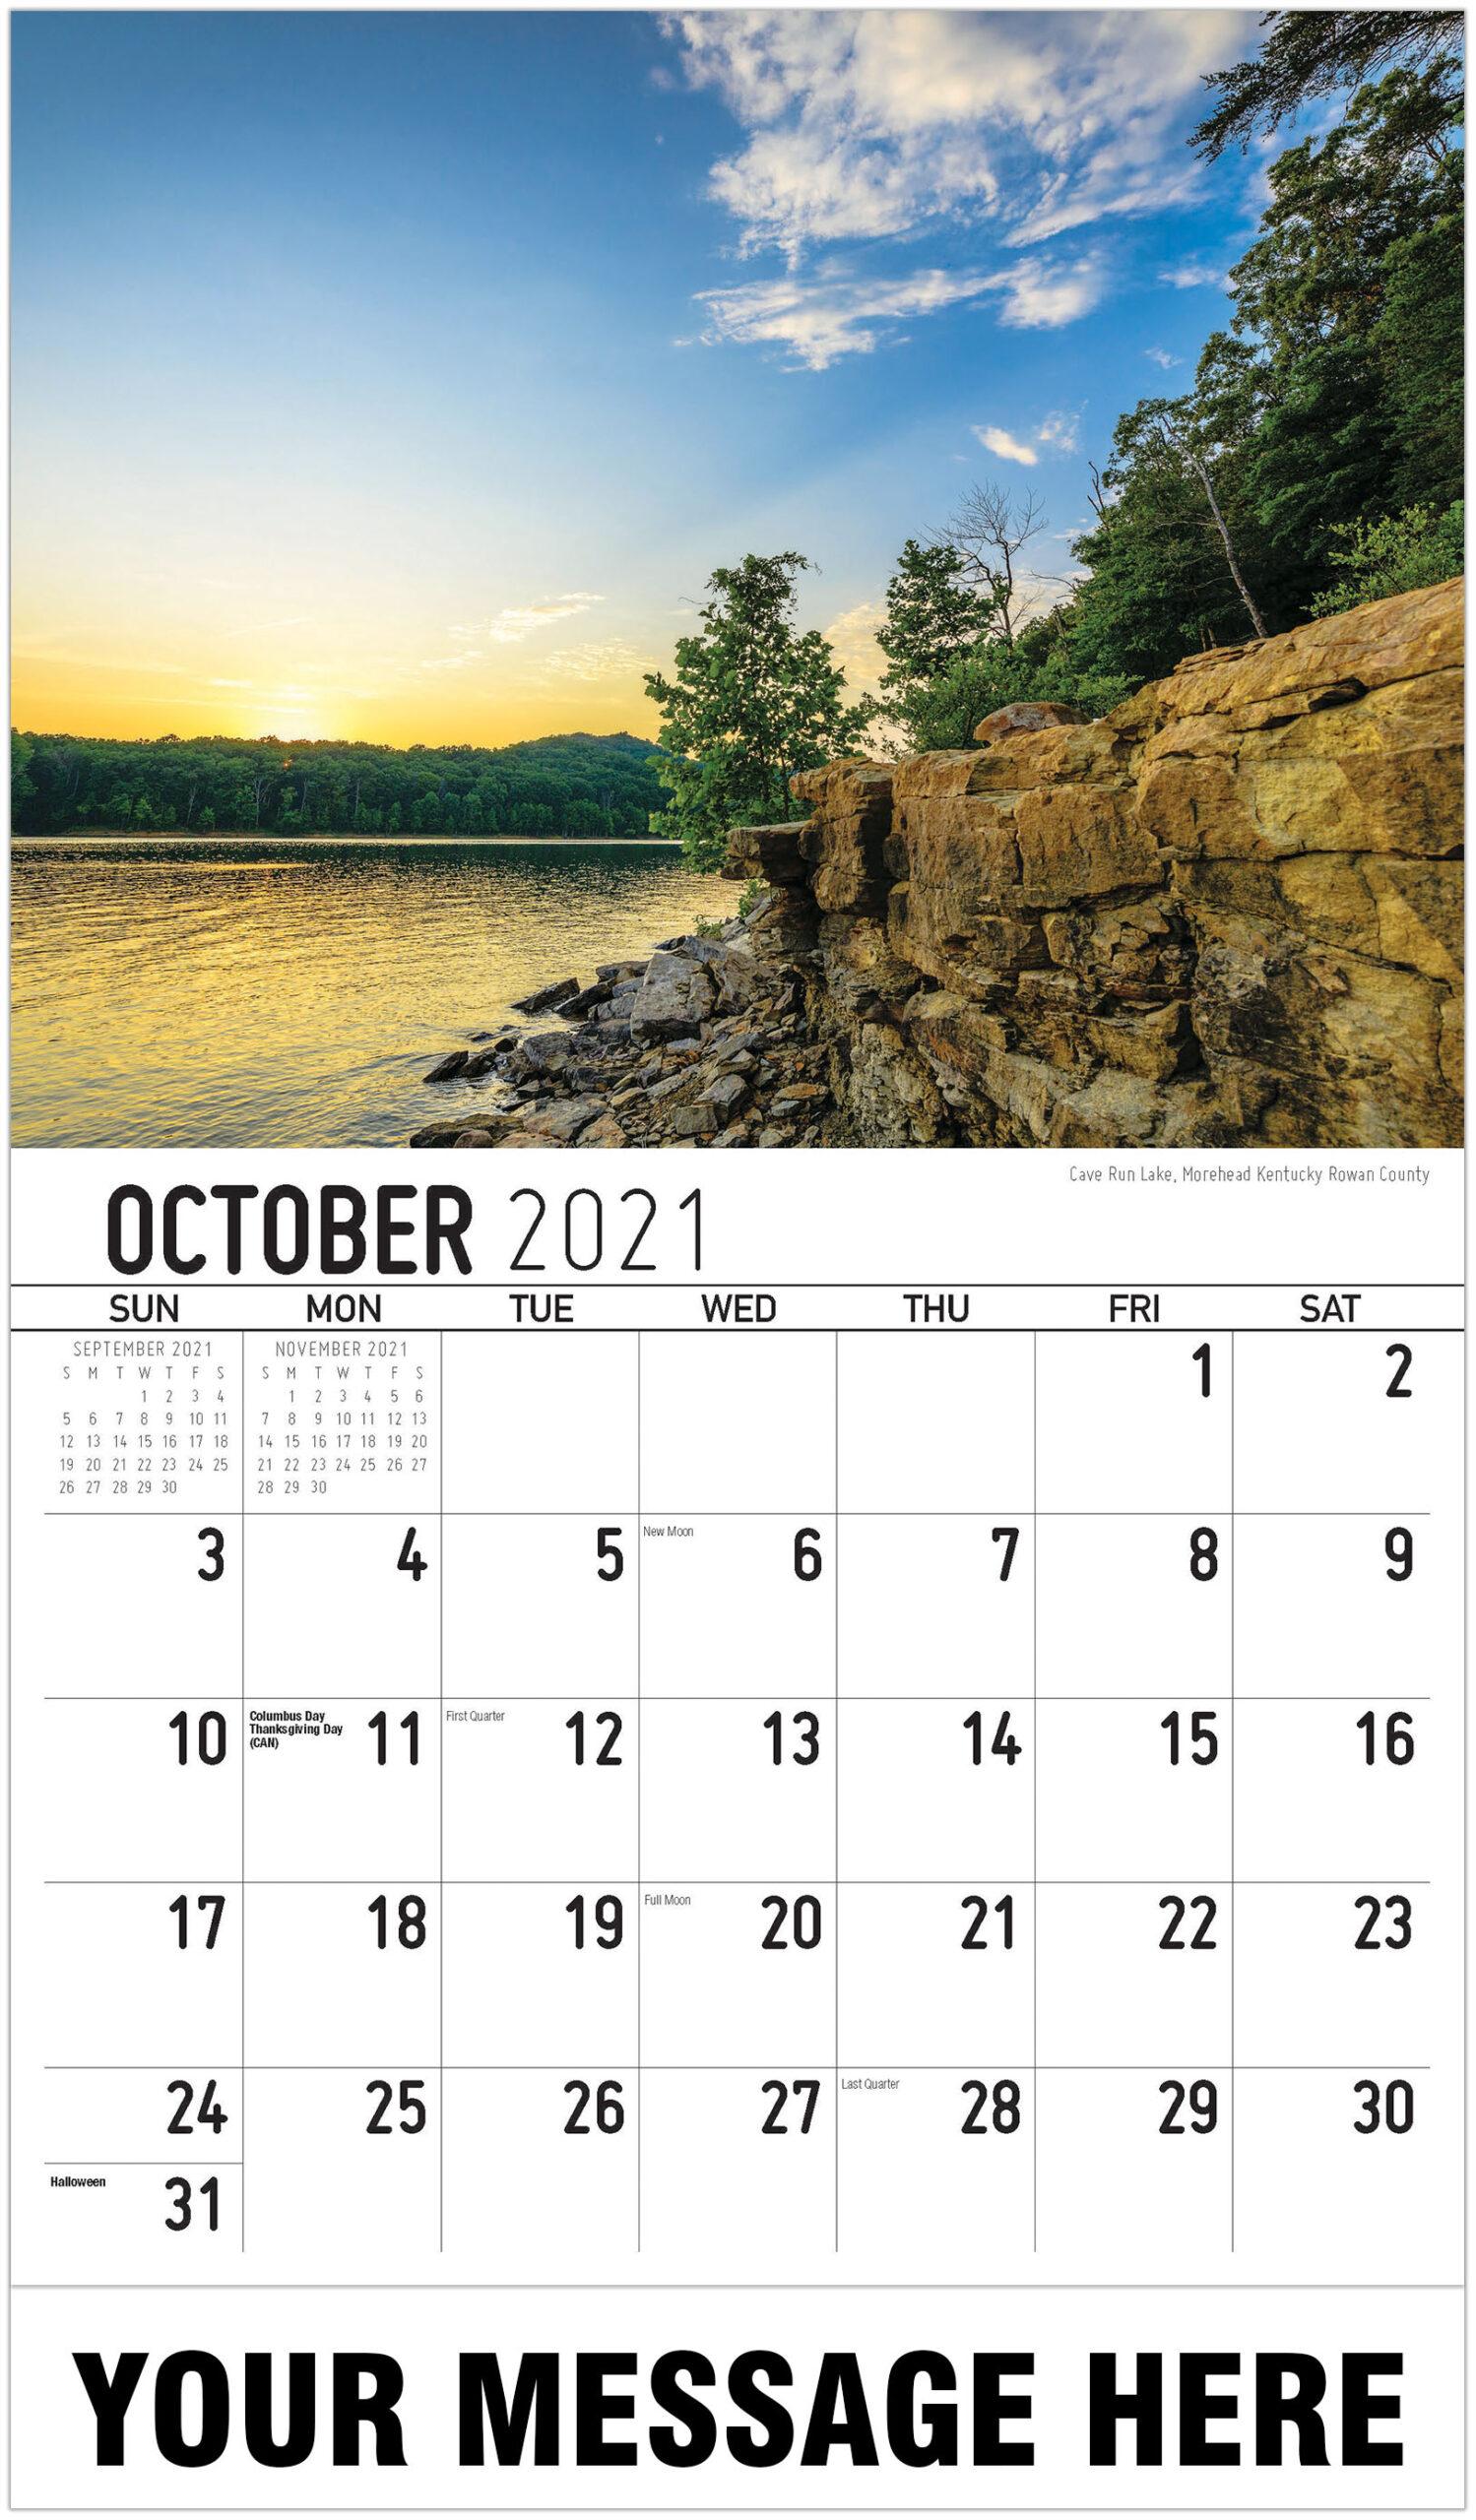 2021 Southeast Usa Scenic Calendar | Business Promotional